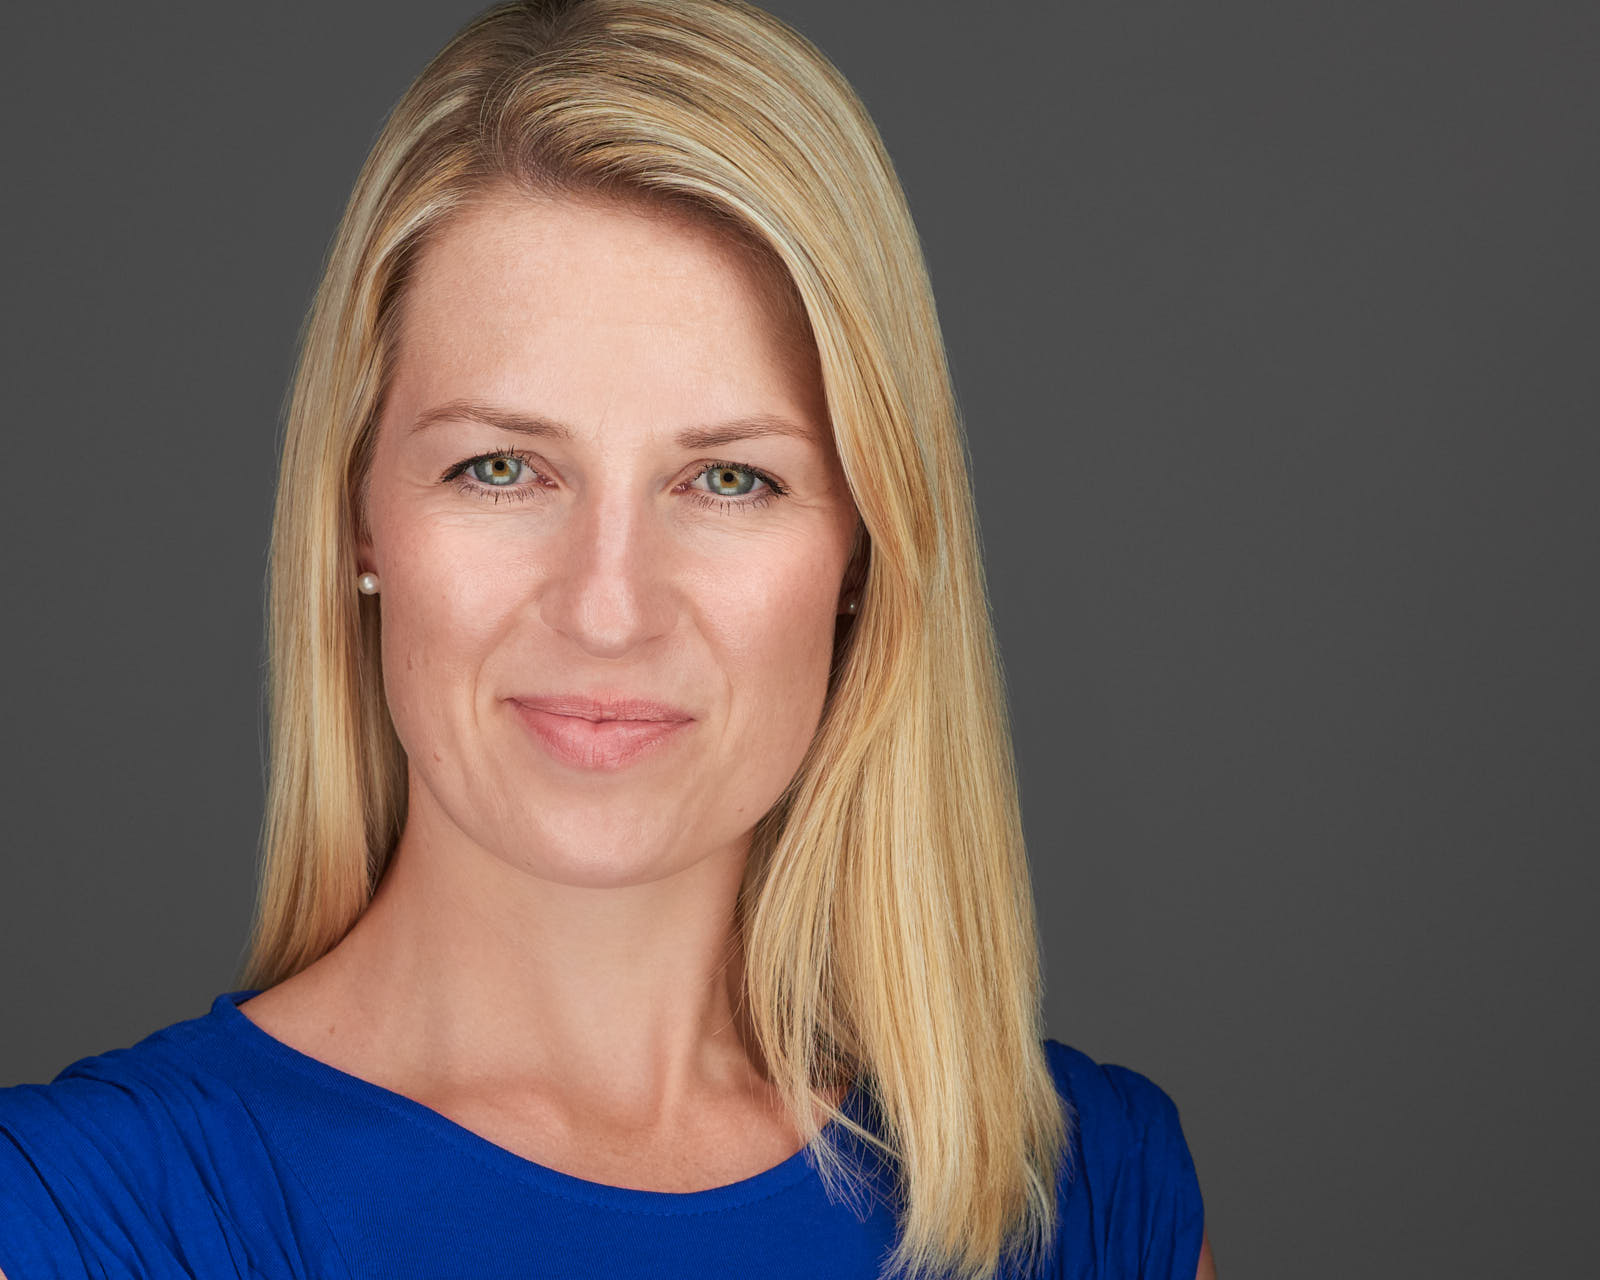 Female CEO Professional Headshot Xing Linkedin Businessportrait Düsseldorf Köln Krefeld, exklusive Bewerbungsfotos